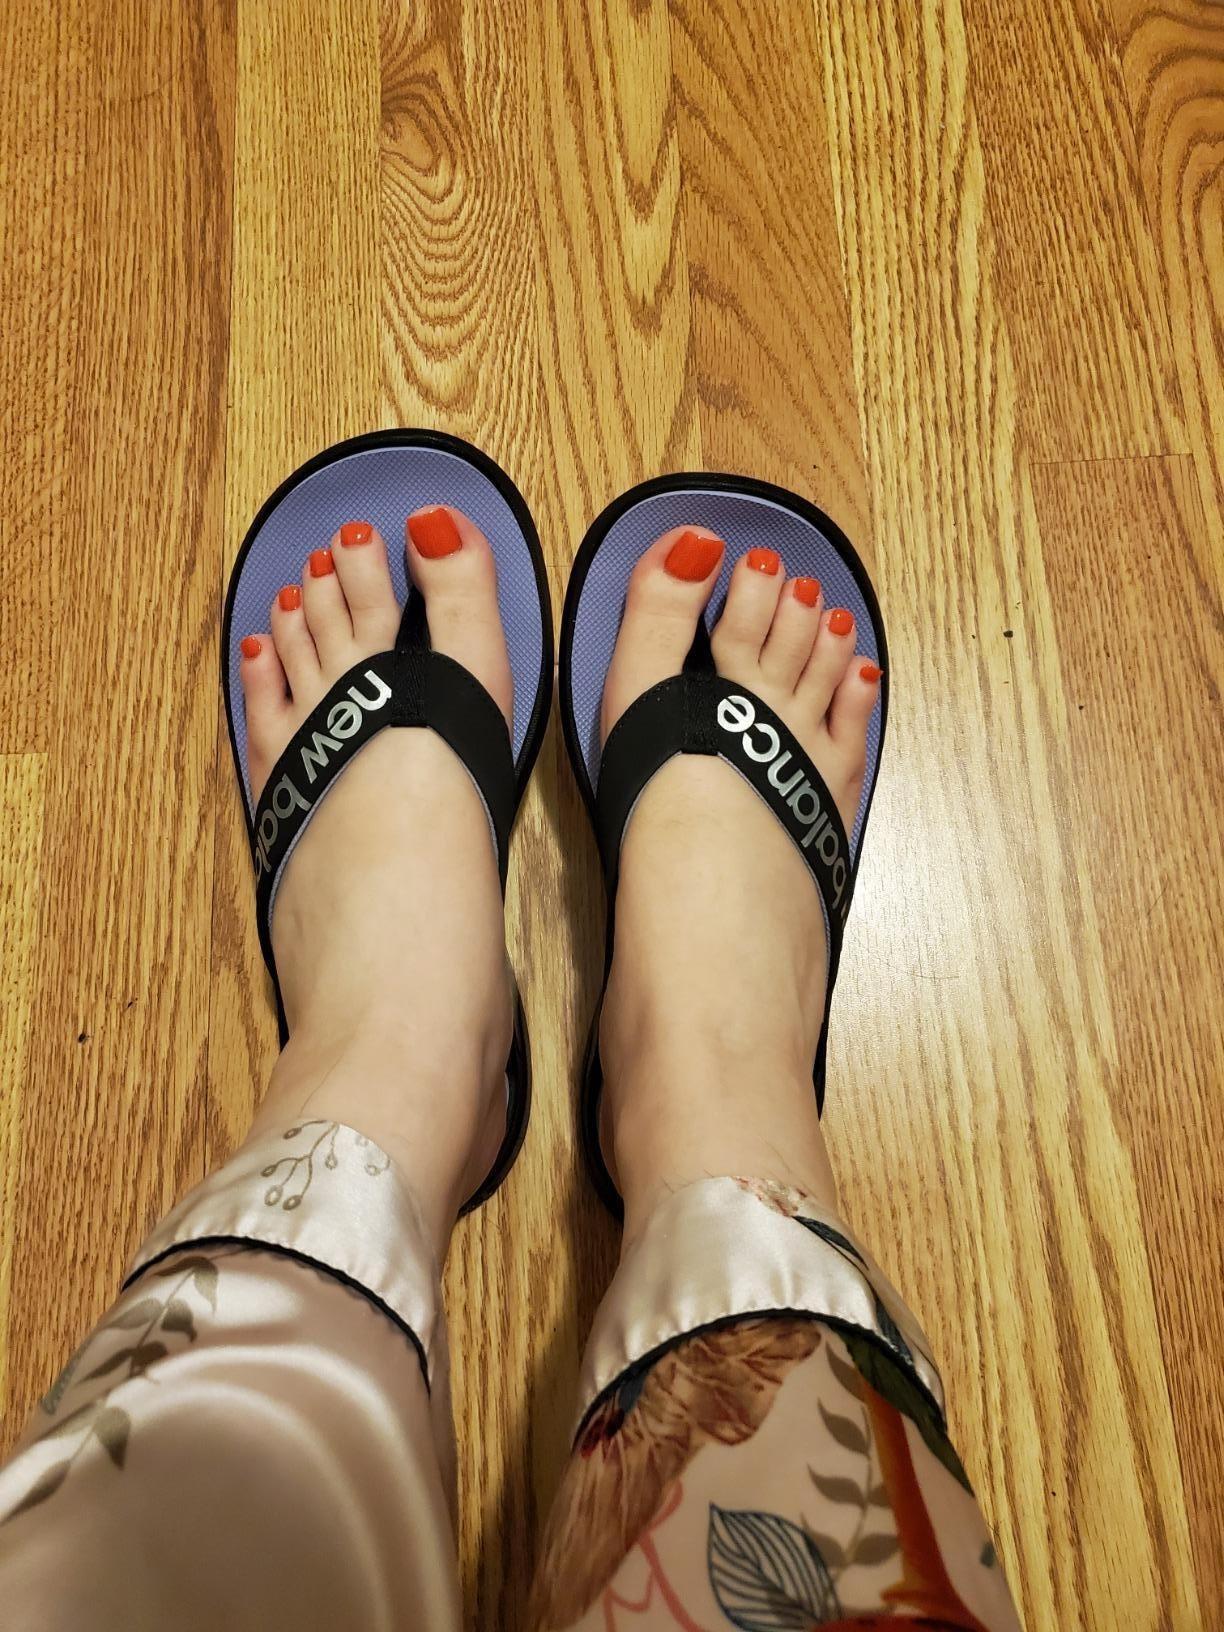 Reviewer wearing New Balance flip-flops in Black/Clear Amethyst/Silvery Metallic